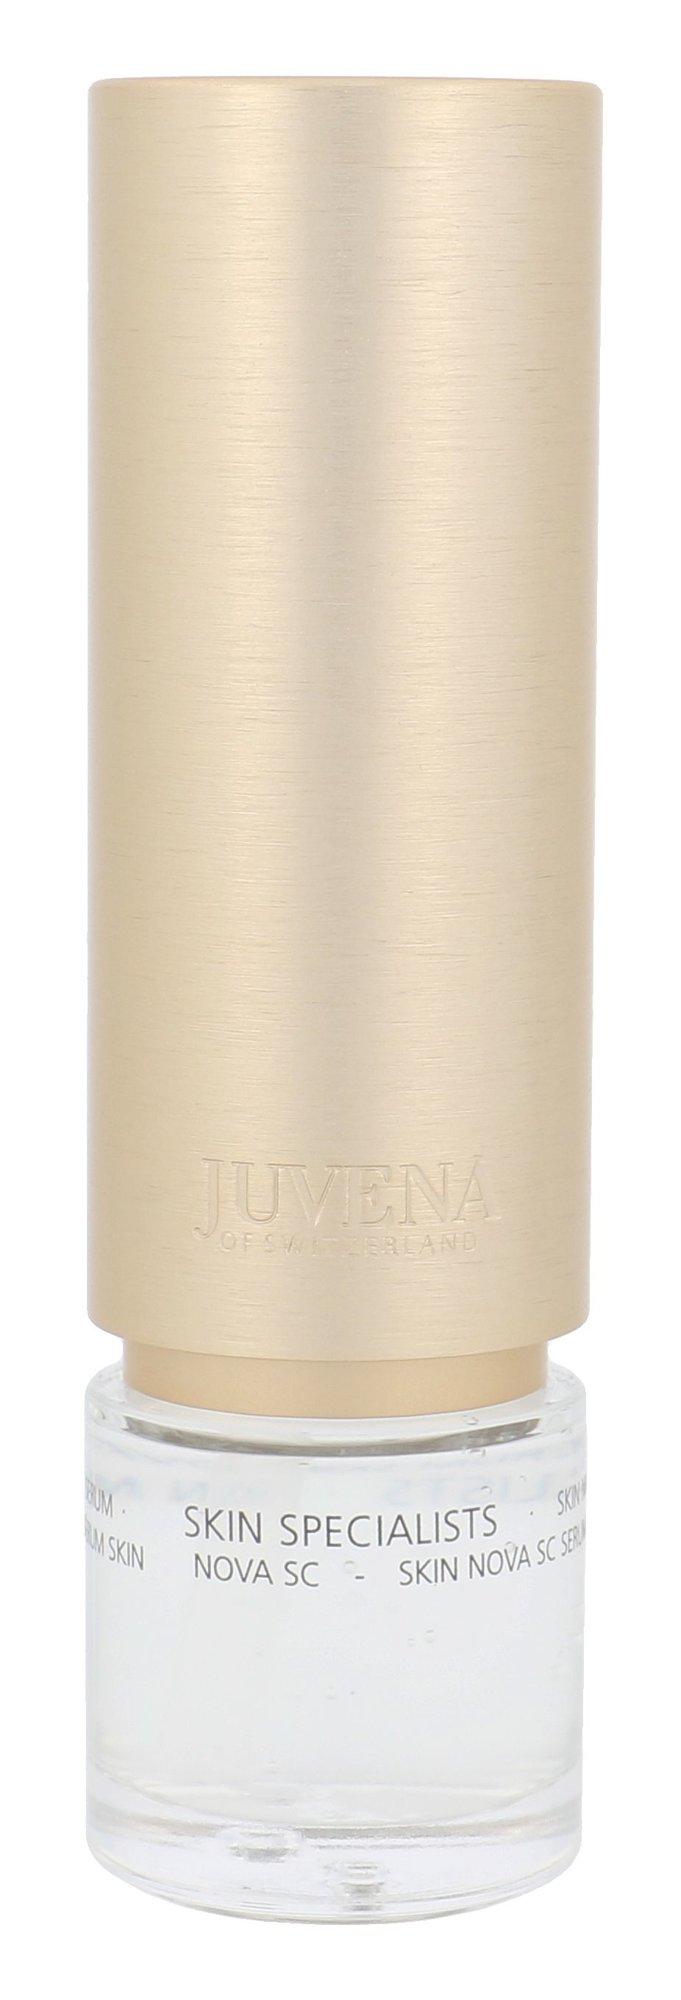 Juvena Specialist Skin Nova SC Serum Cosmetic 30ml